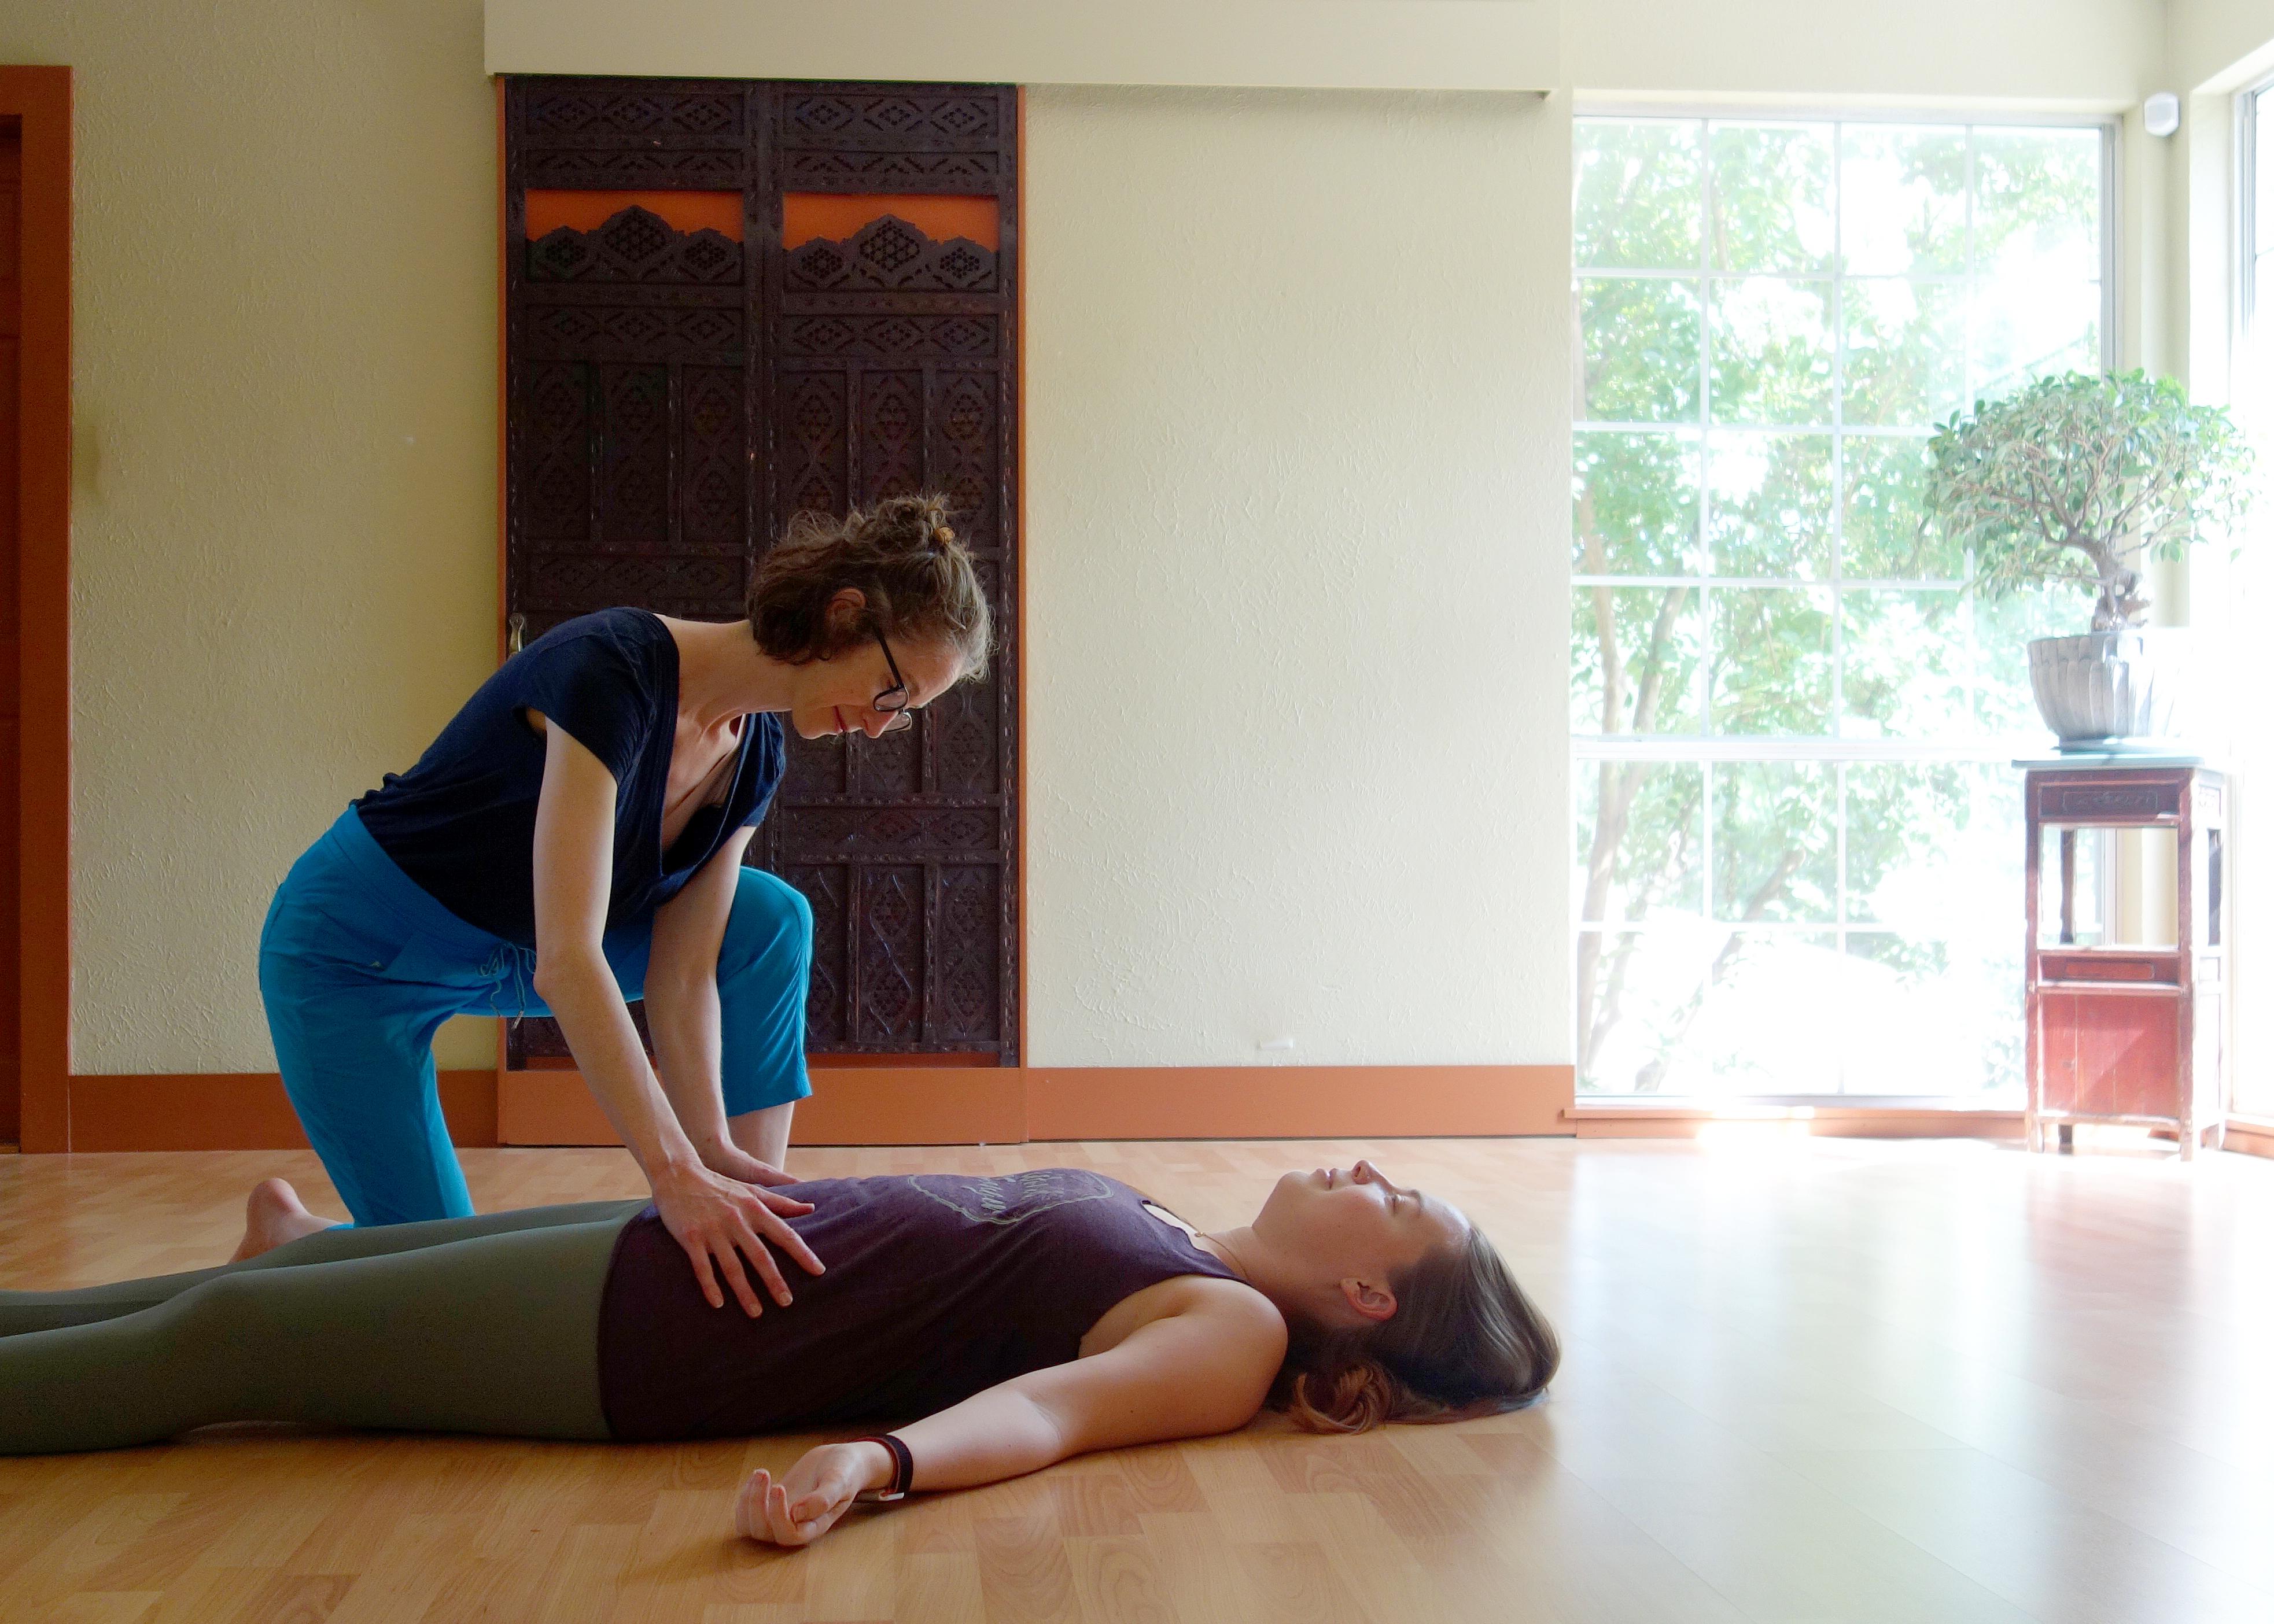 somatic yoga dallas Jessica O'Keefe Jessie King Private Session